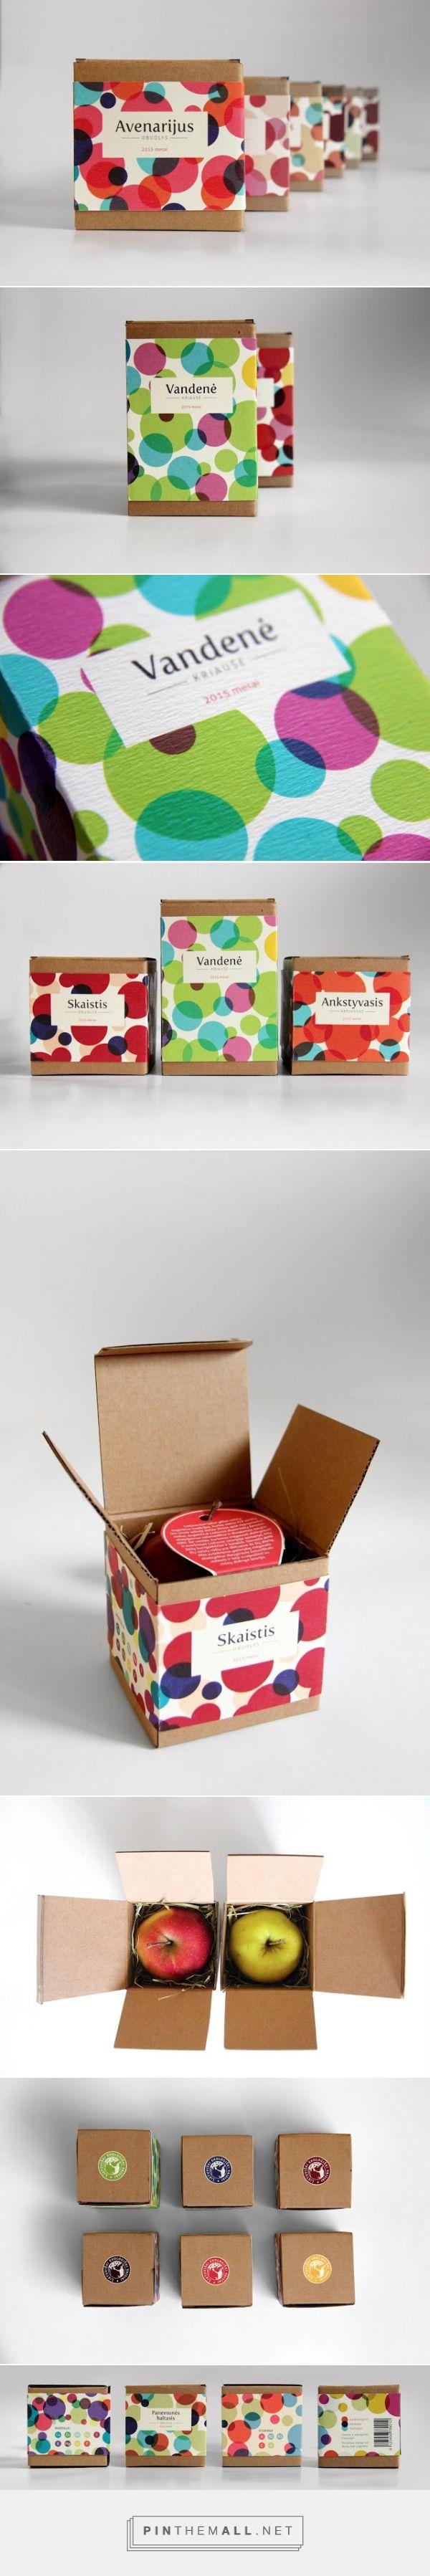 Packaging of Lithuanian Fruits / Edmundas Jankauskas